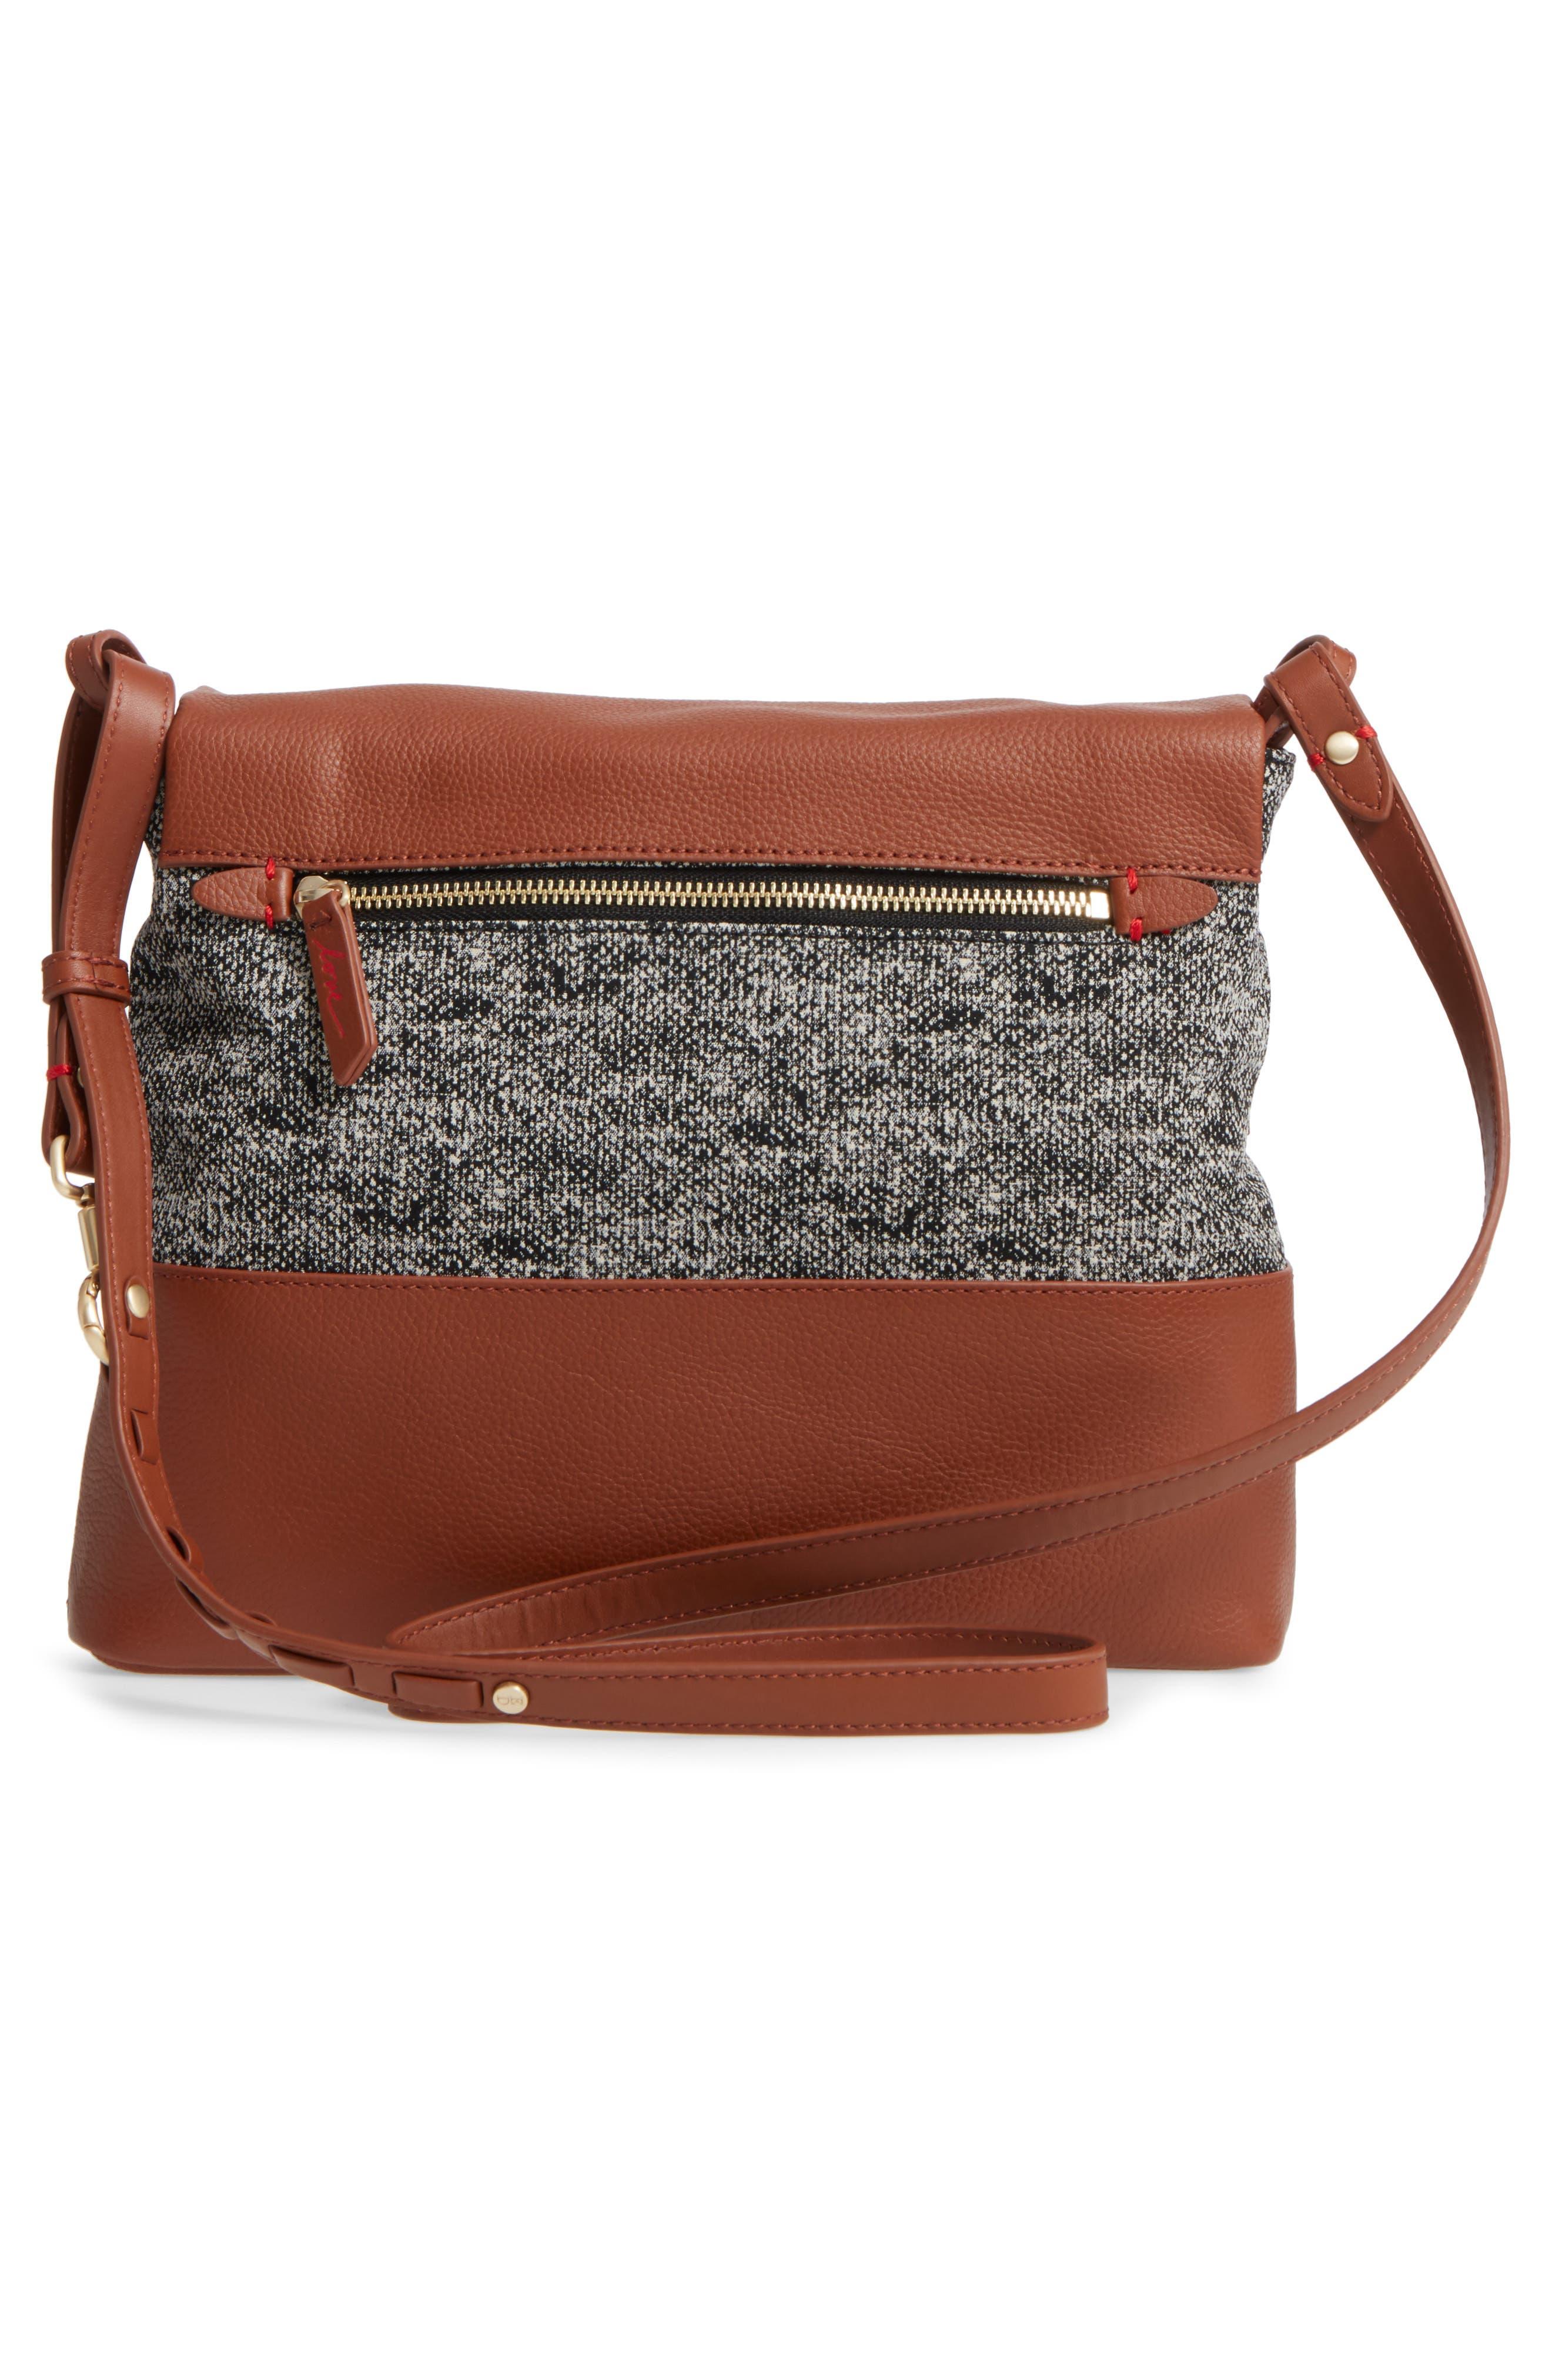 Medium Brea Crossbody Bag,                             Alternate thumbnail 2, color,                             Whiskey